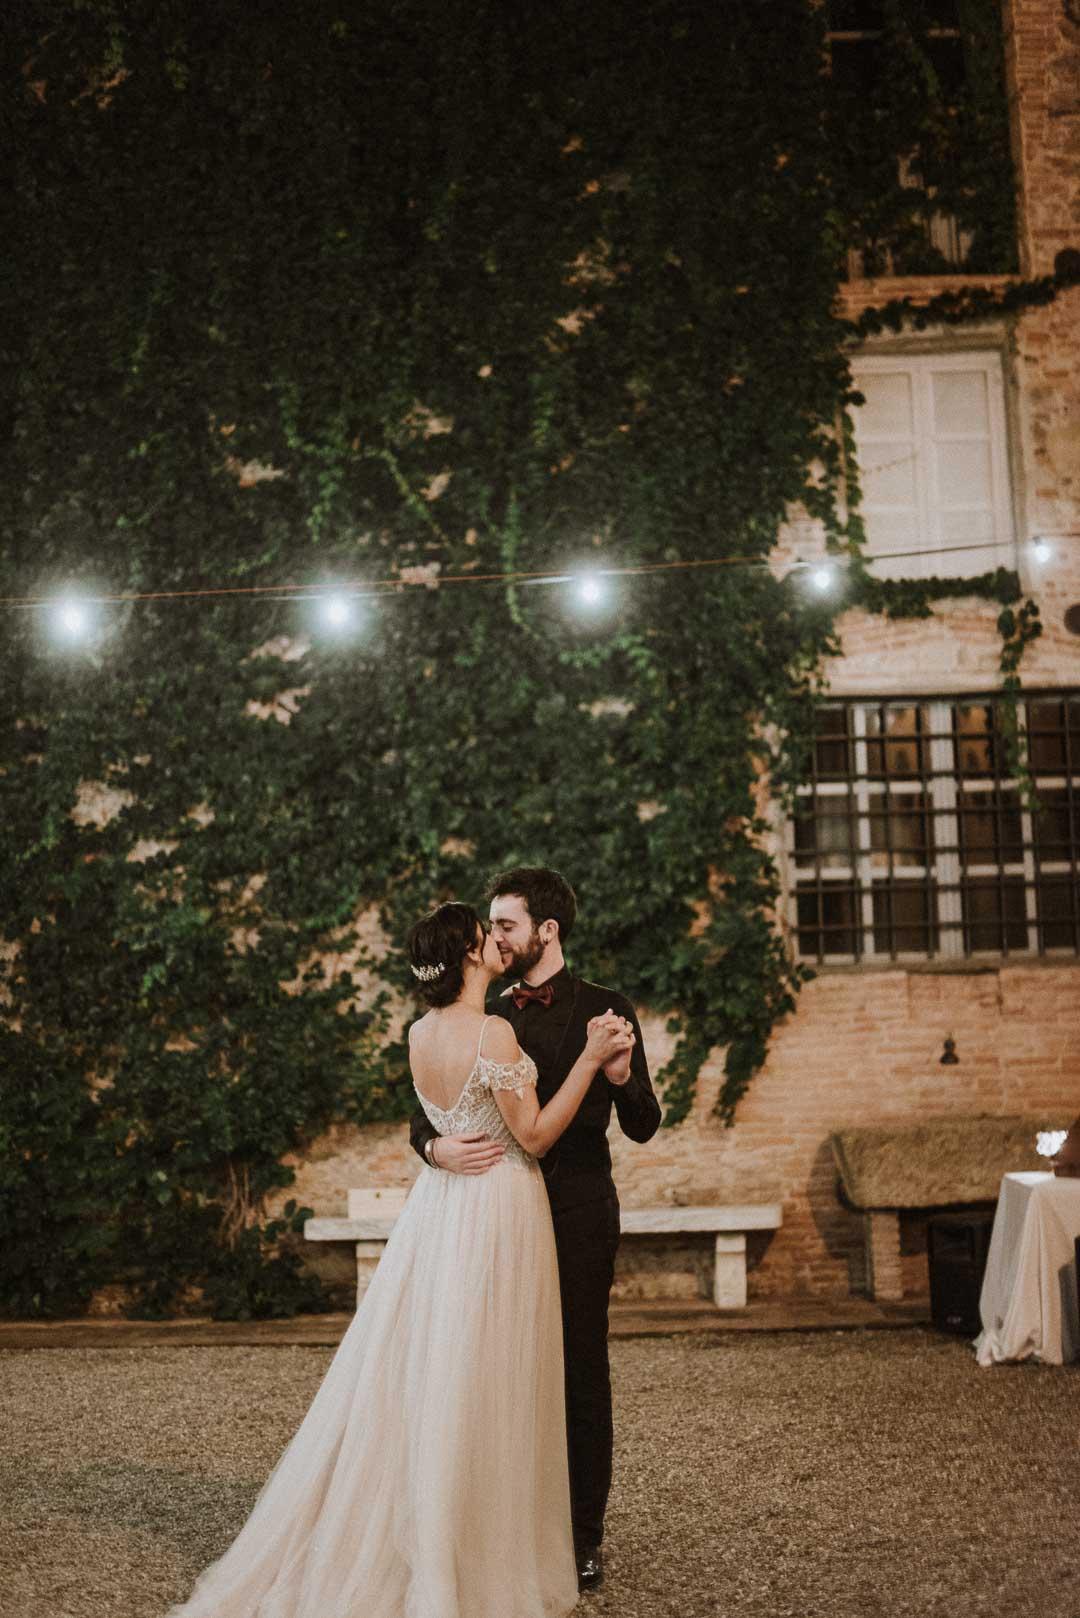 wedding-photographer-destination-fineart-bespoke-reportage-tuscany-villascorzi-vivianeizzo-spazio46-176